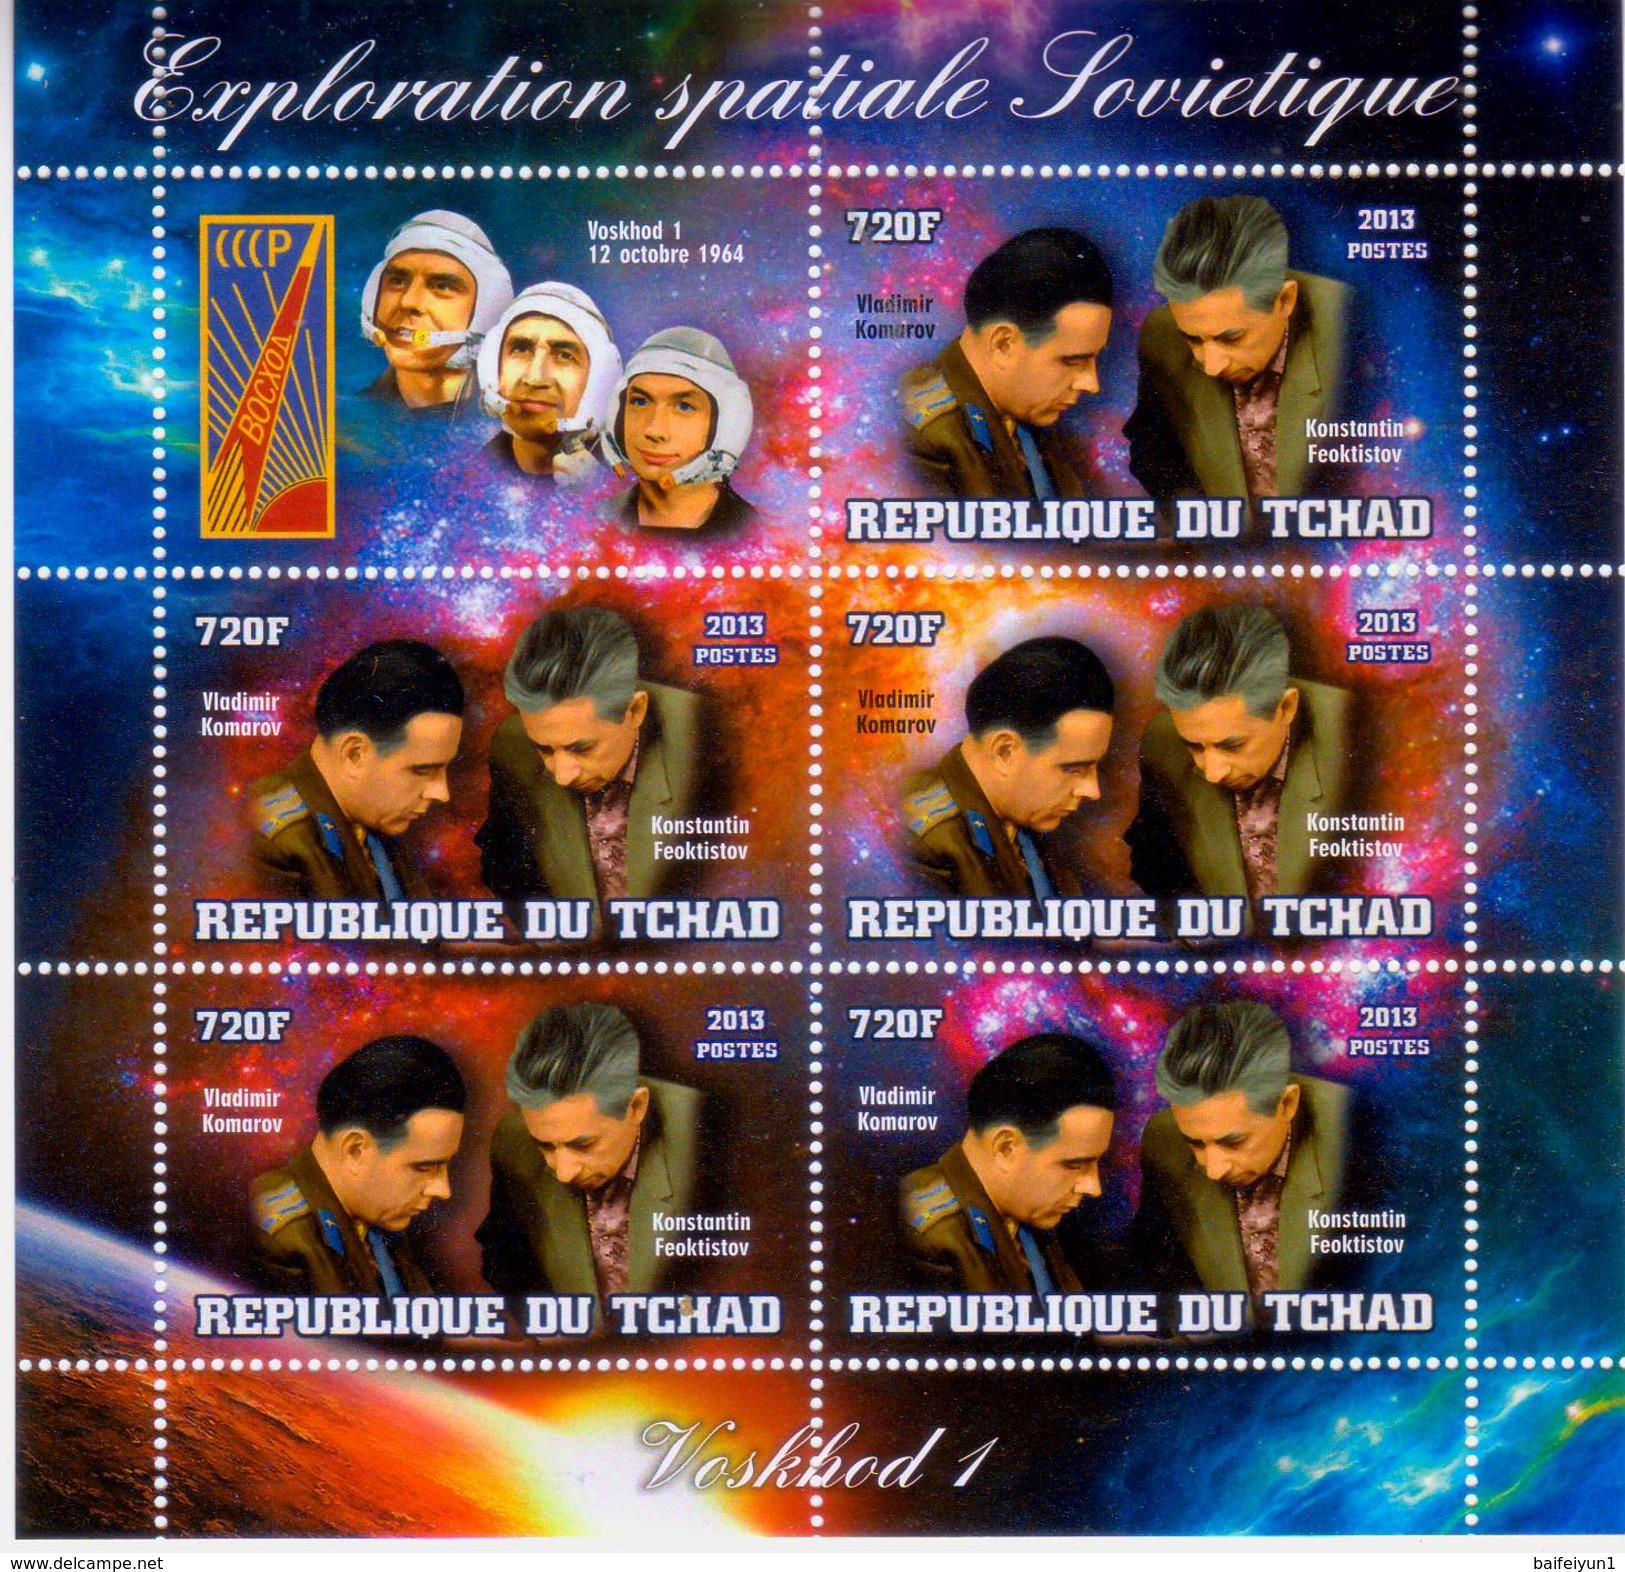 Chad 2013 Stamps Voskhod-1 Spacecraft Cosmonaut Vladimir Komarov And Konstantin Feoktistov  Two MS - Africa